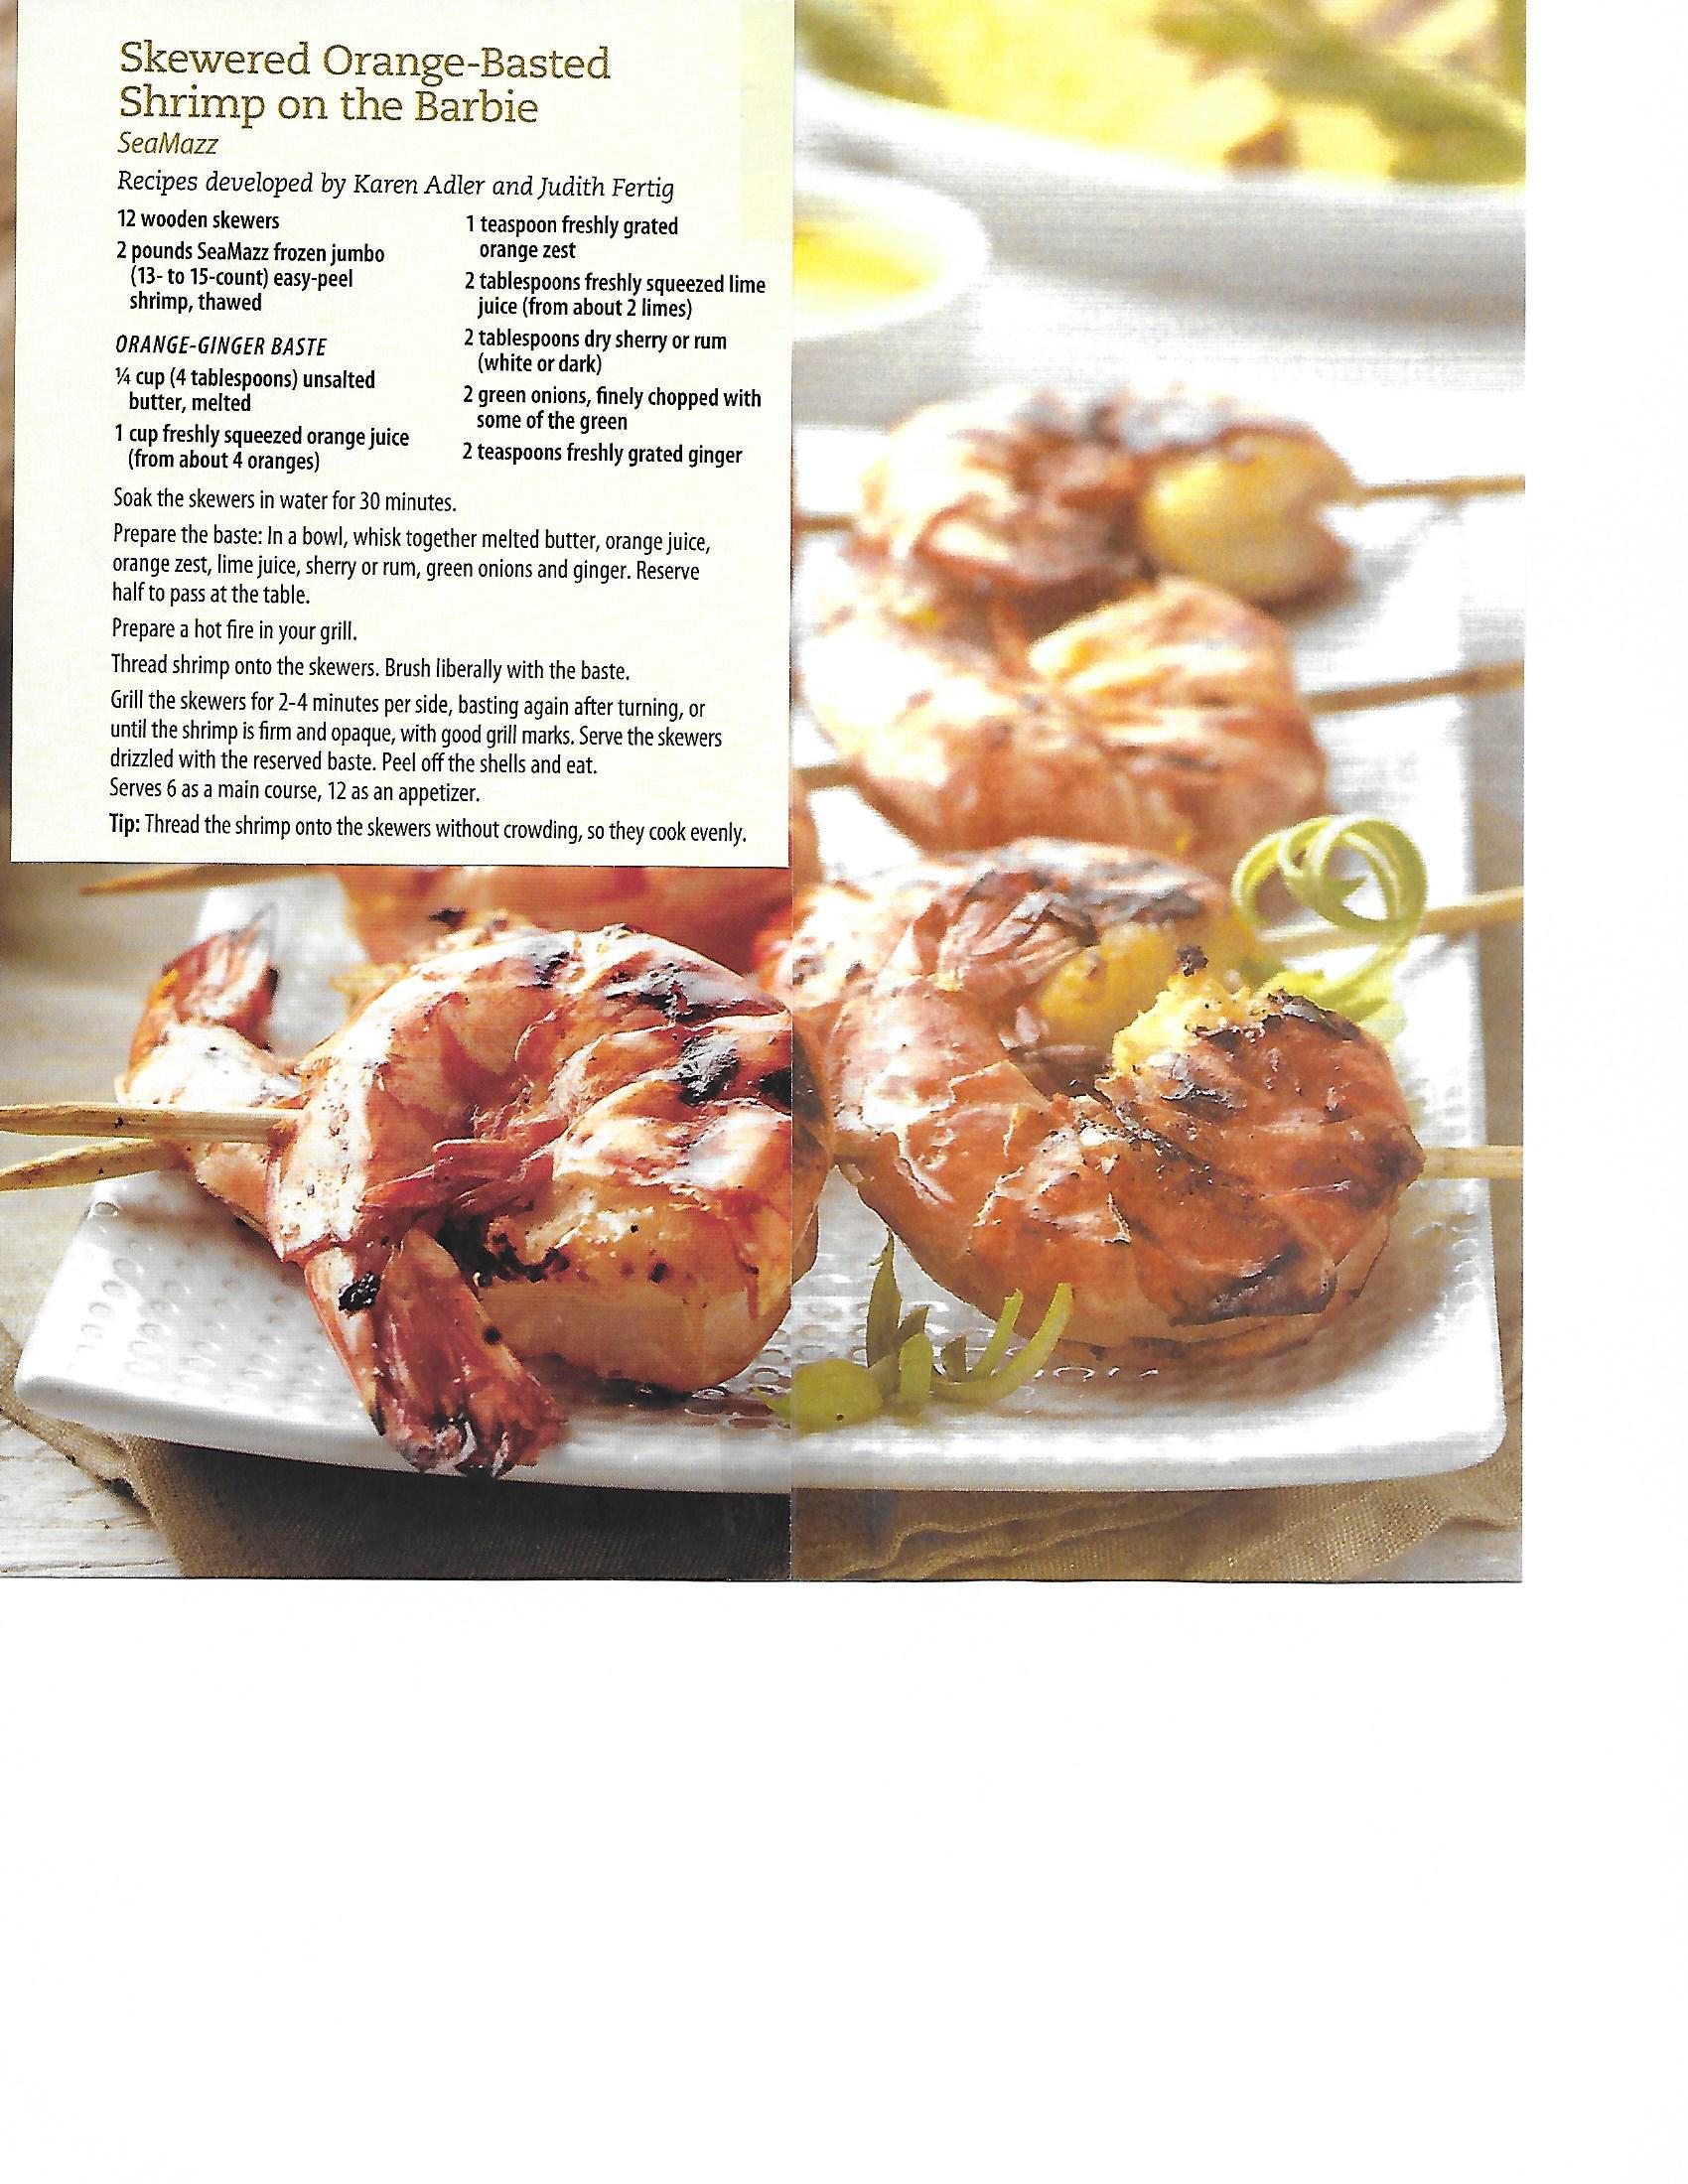 Costco Shrimp 4.jpg